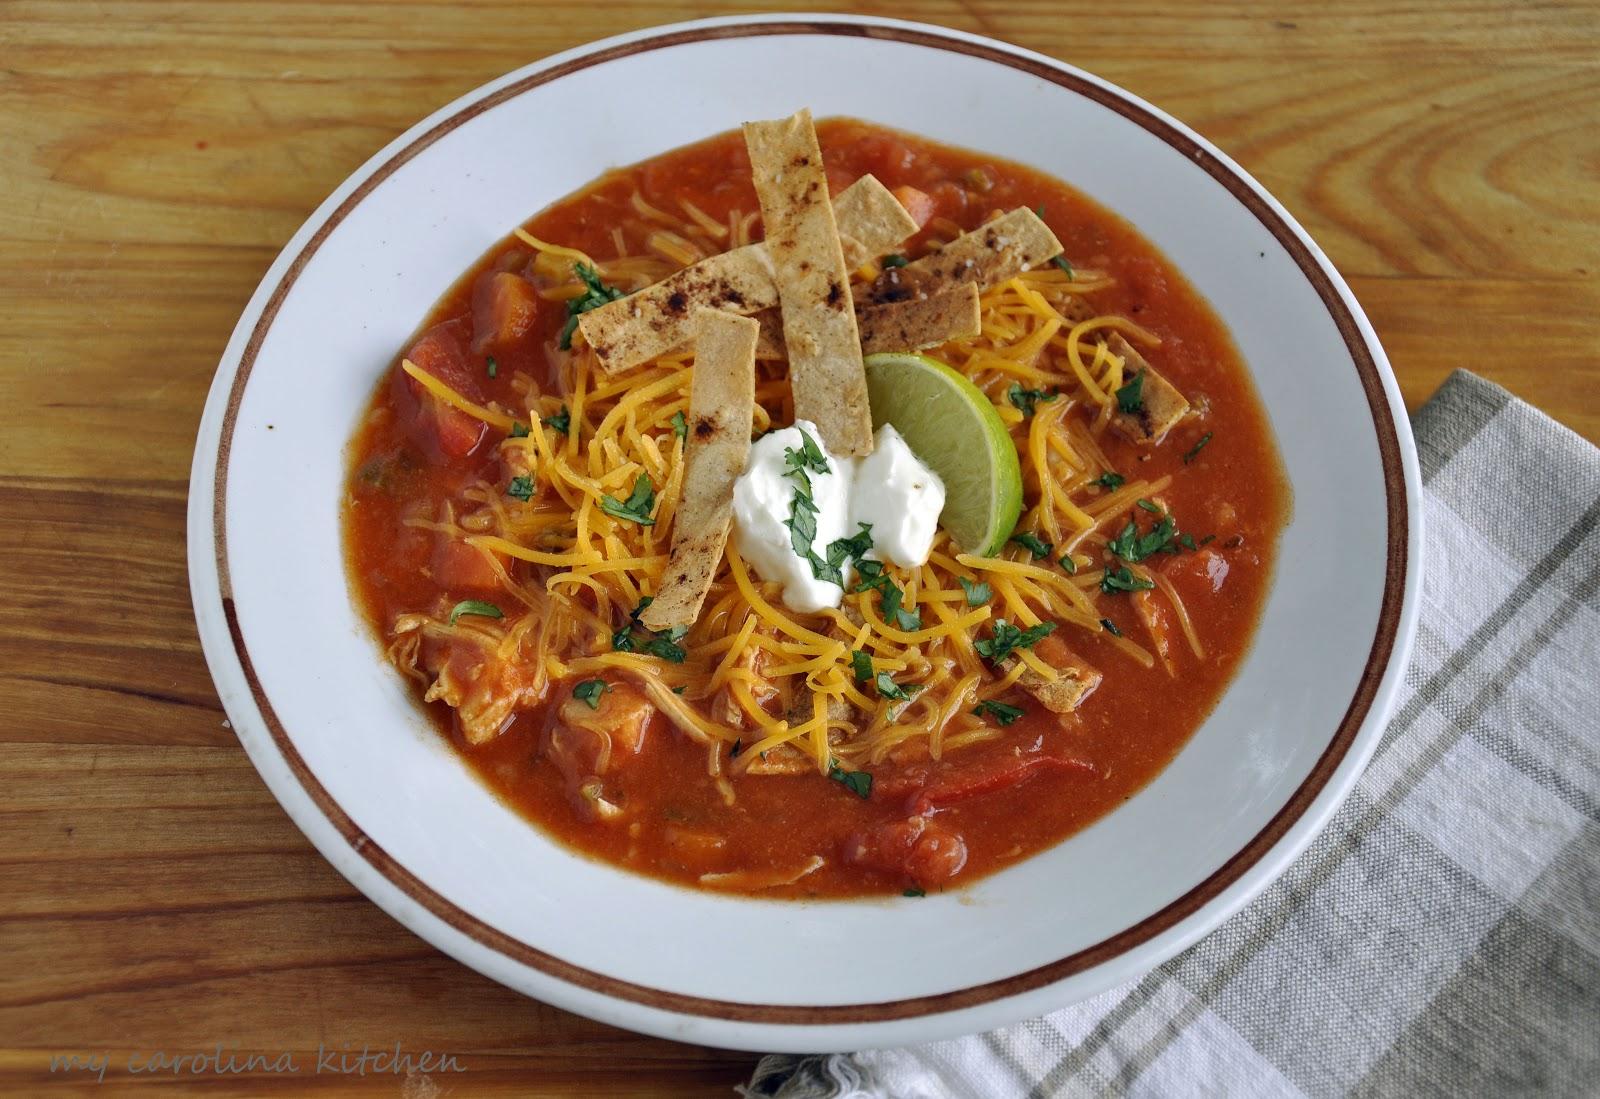 My Carolina Kitchen My Carolina Kitchen Celebrates 4